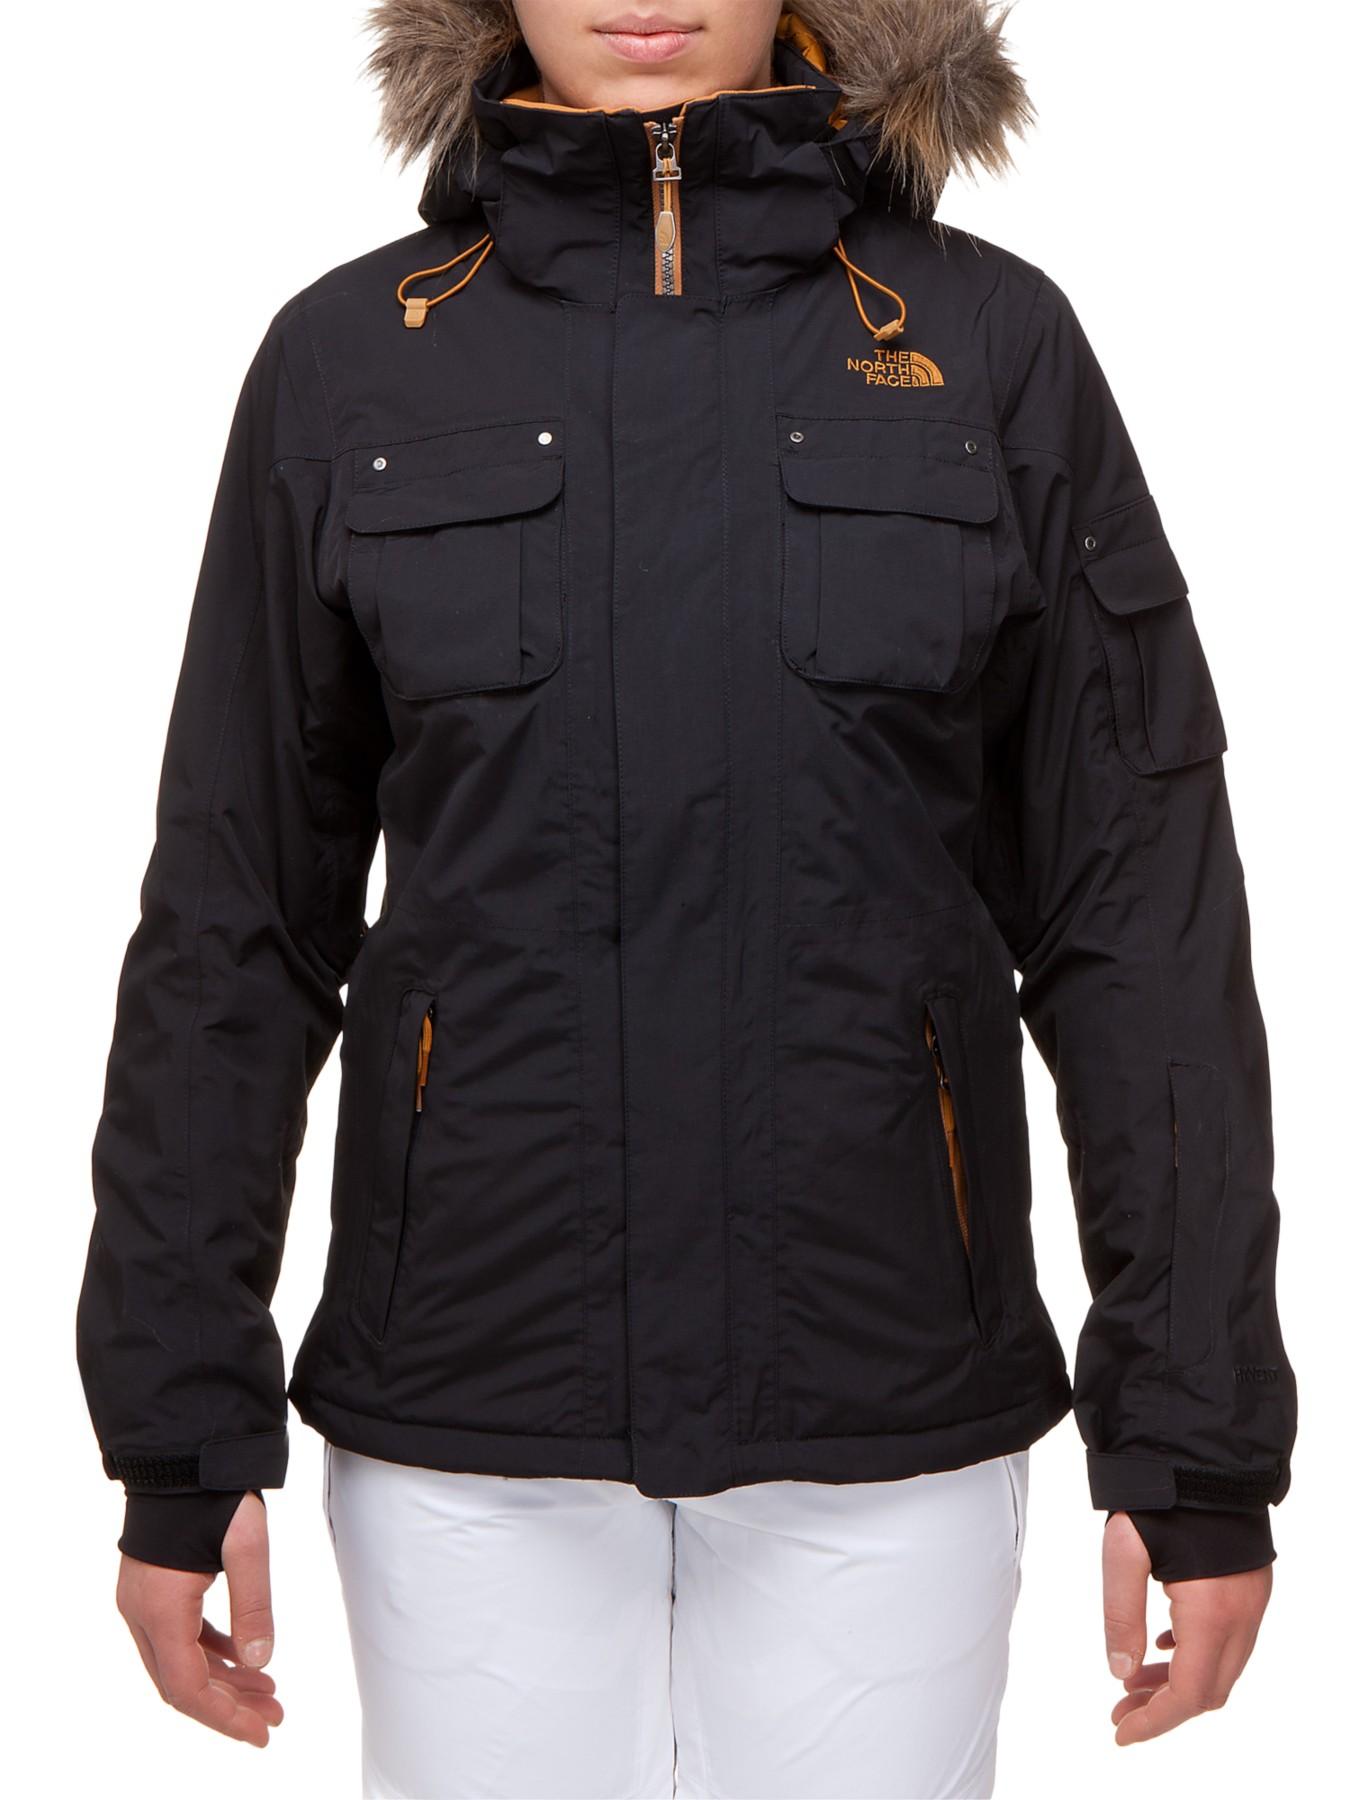 c74628278 The North Face Black Baker Jacket